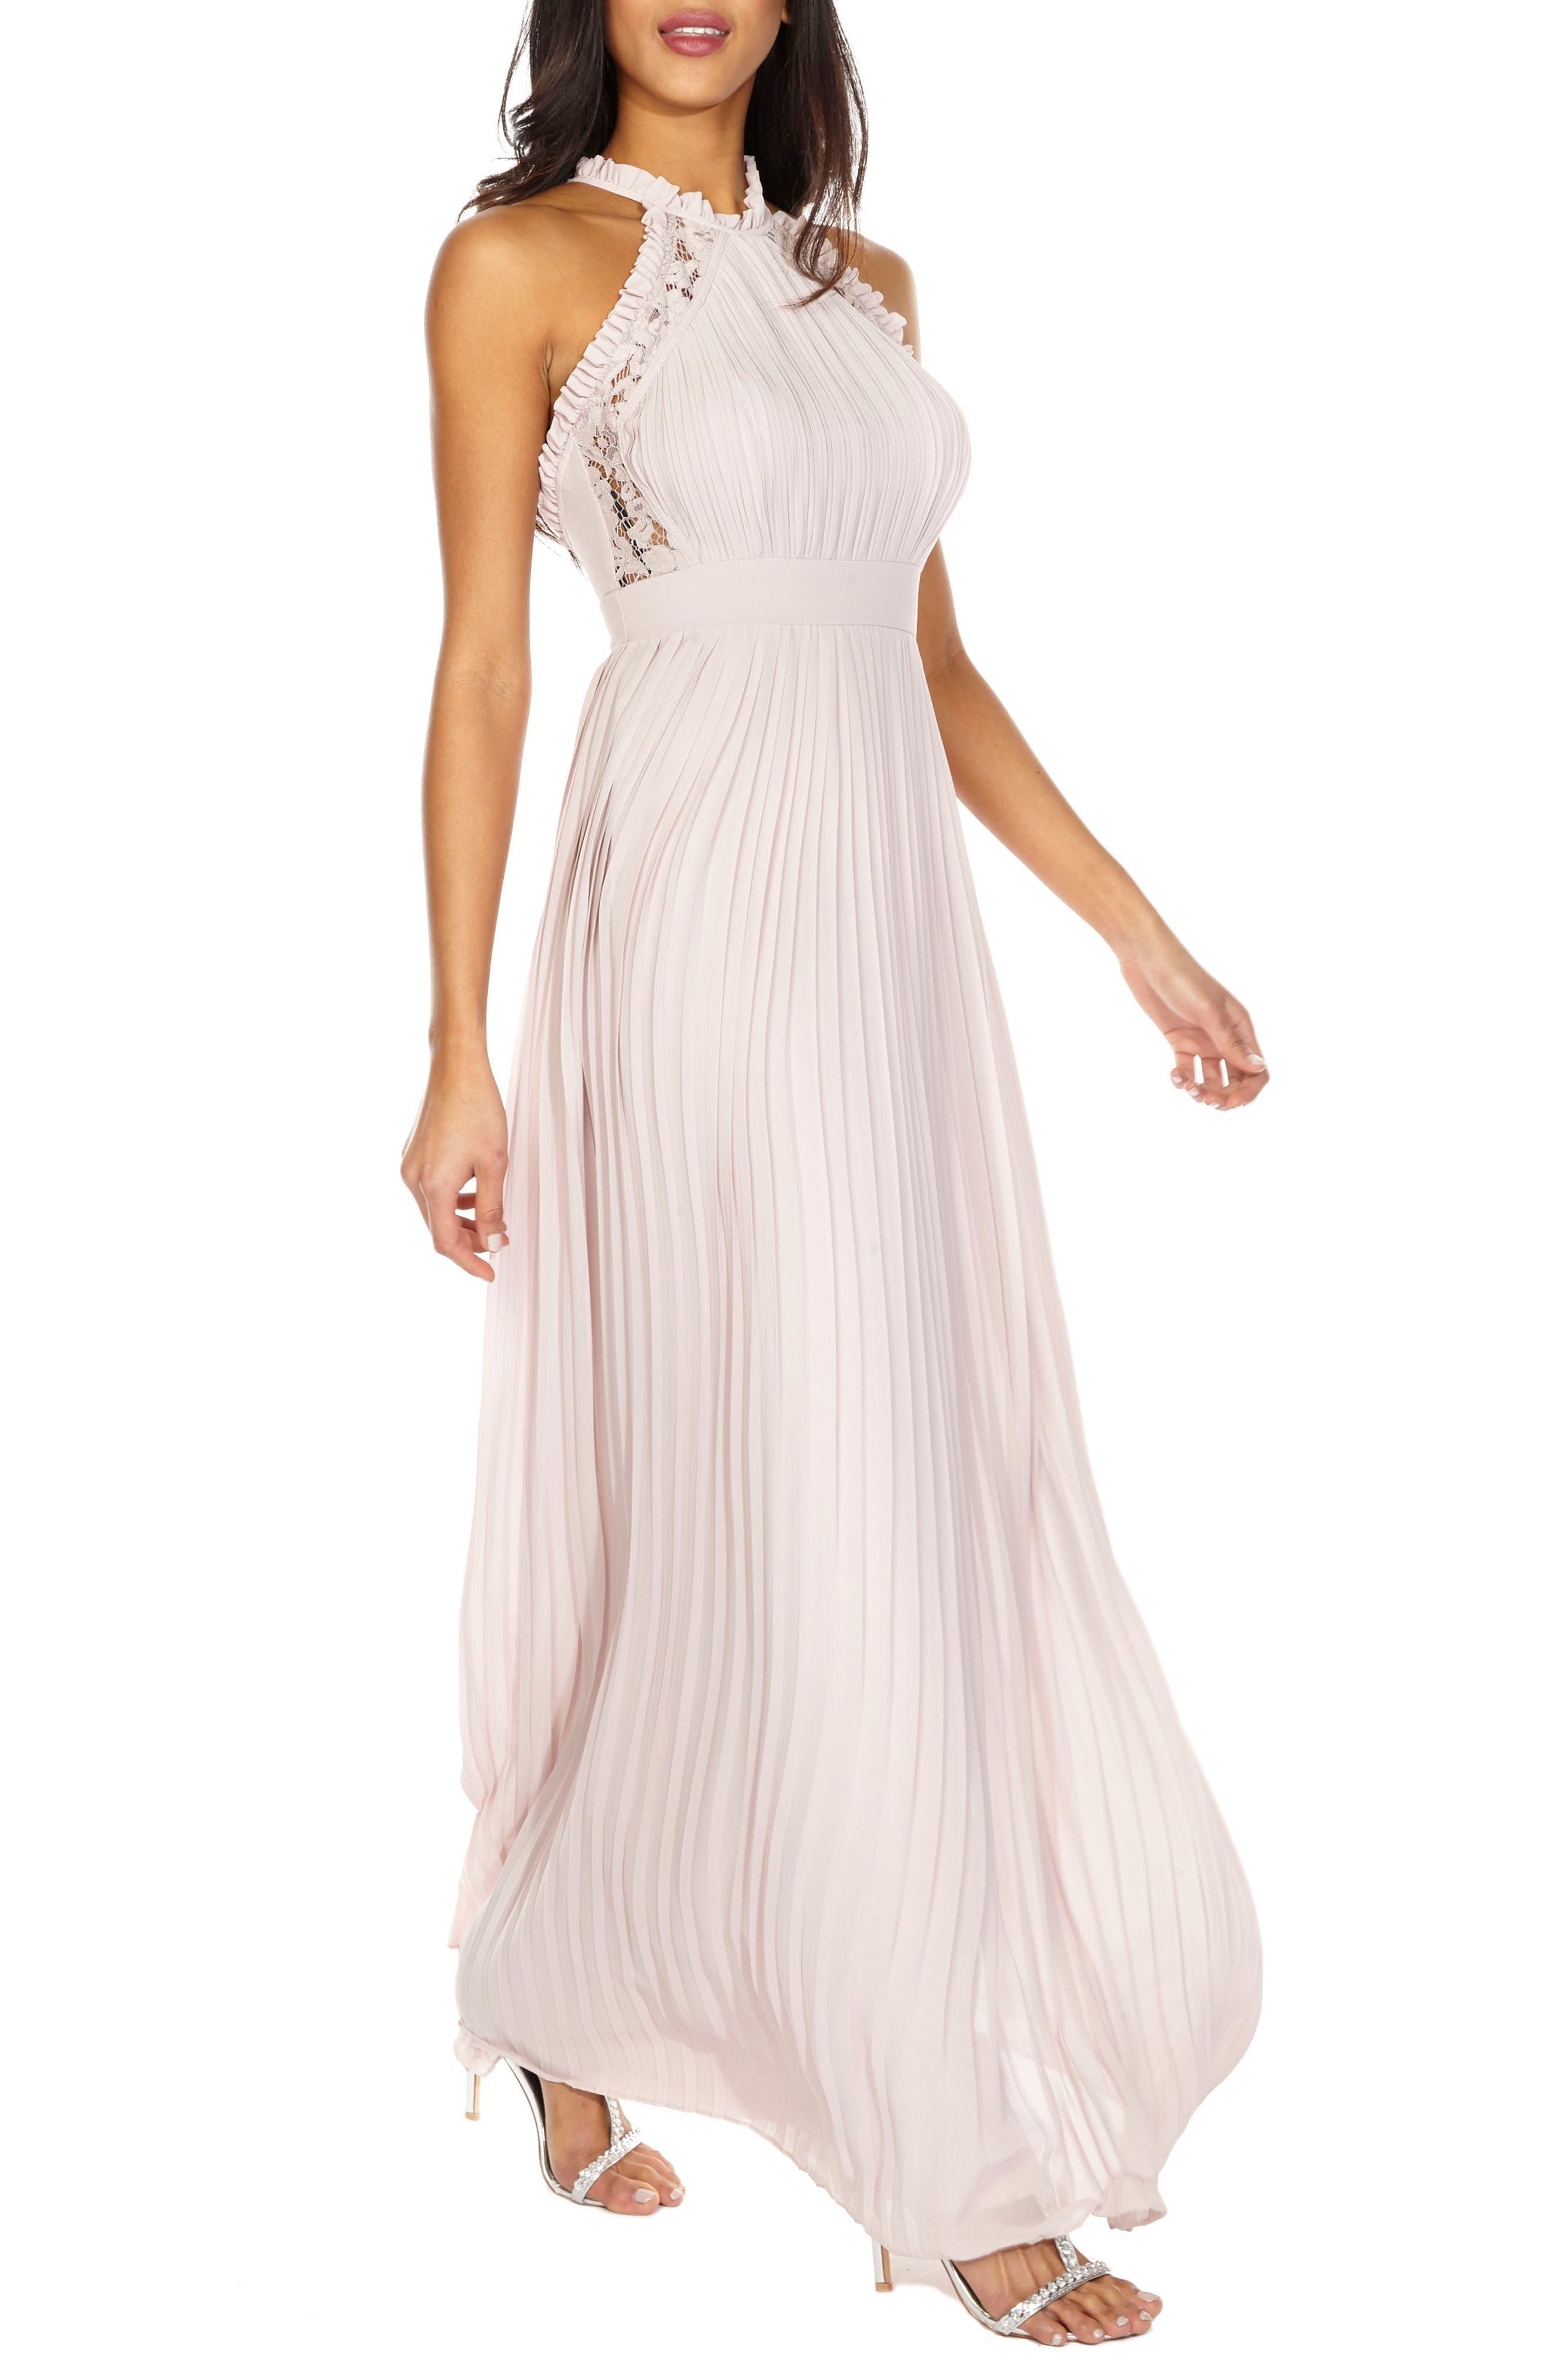 Dousha Pleated Halter Gown,                             Main thumbnail 1, color,                             Mink